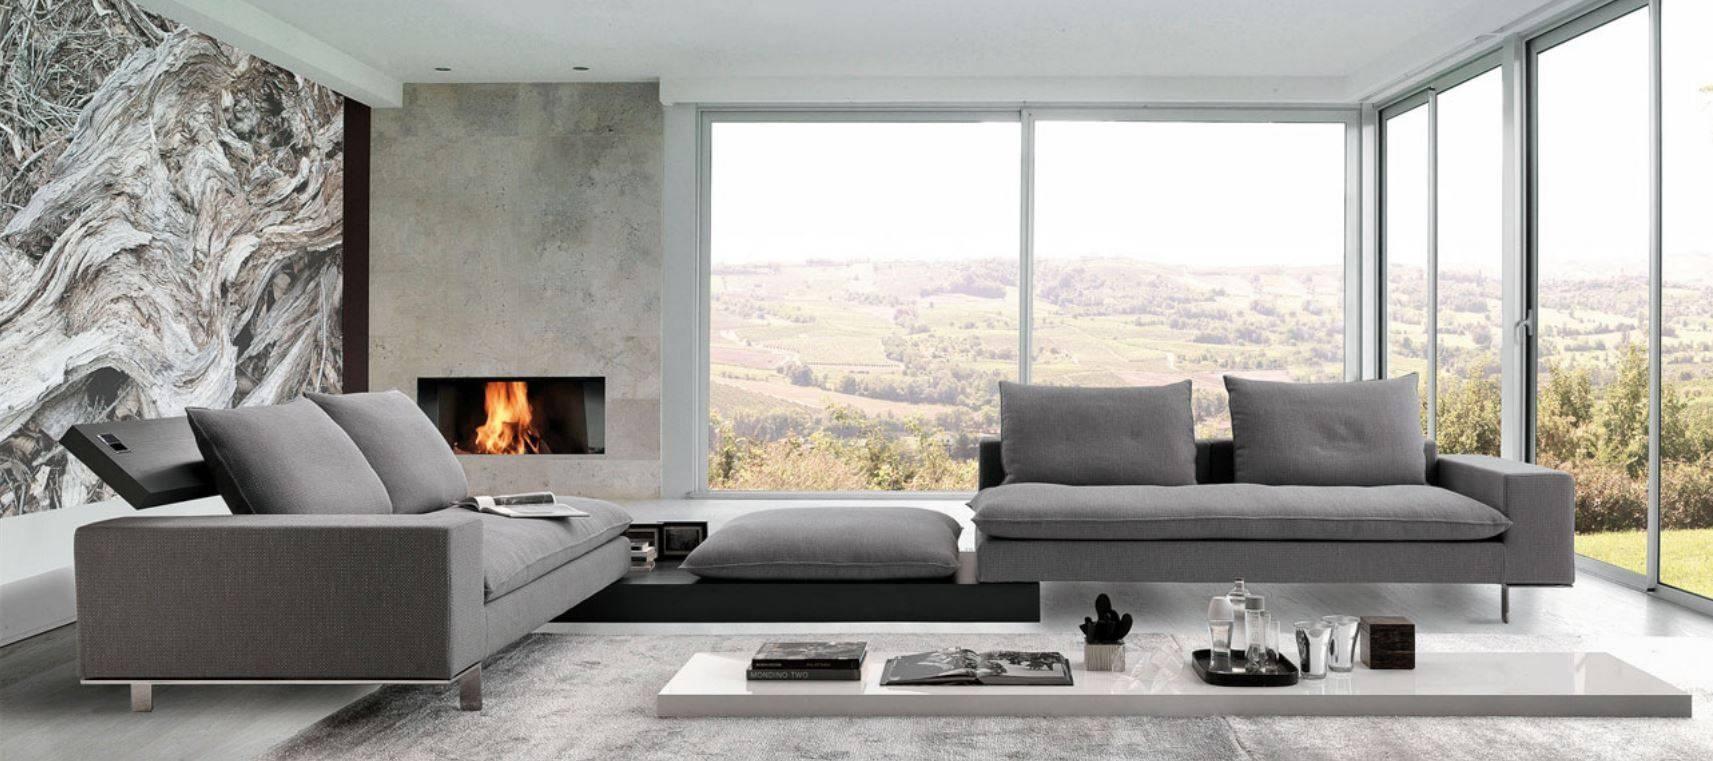 Sectional-Sofas-Italian-Furniture-Design-Ideas | Home Furniture regarding Modern Sofas (Image 12 of 15)